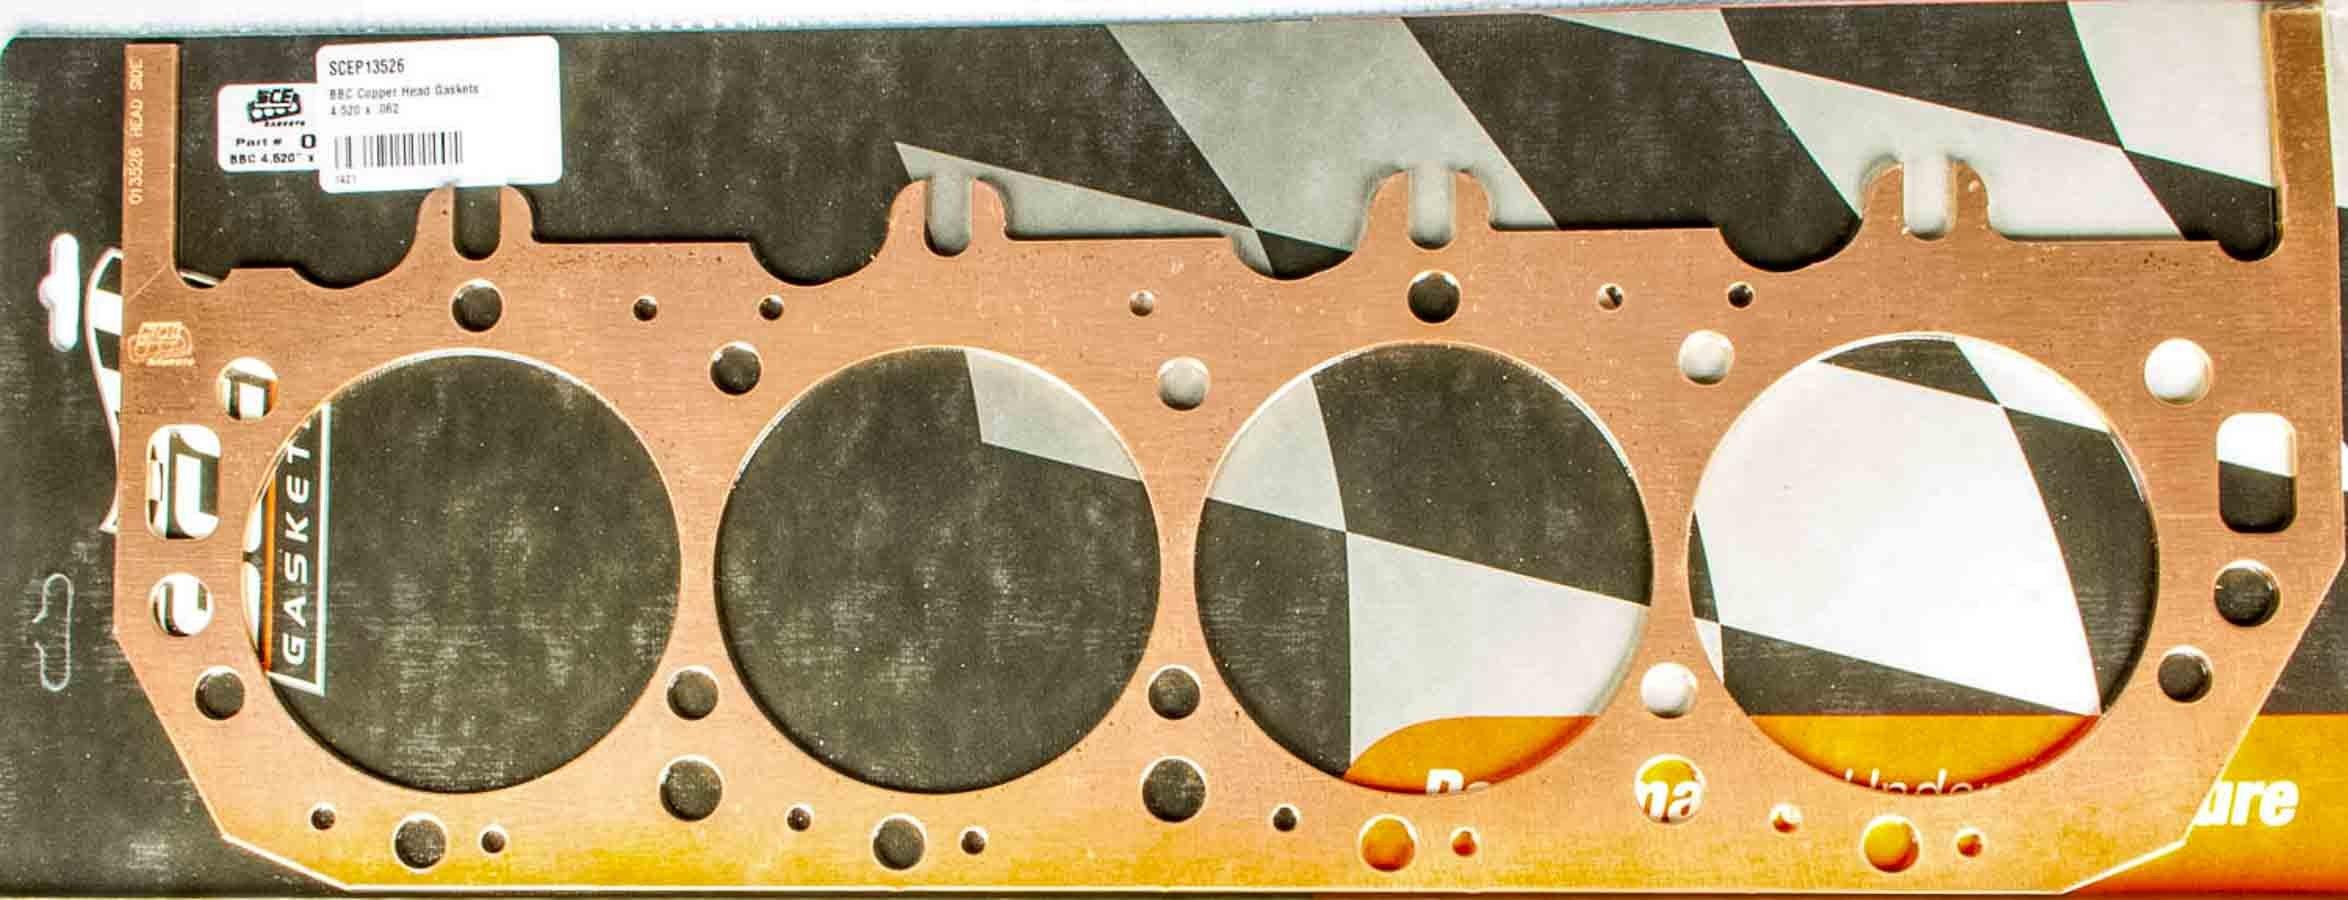 BBC Copper Head Gaskets 4.320 x .042